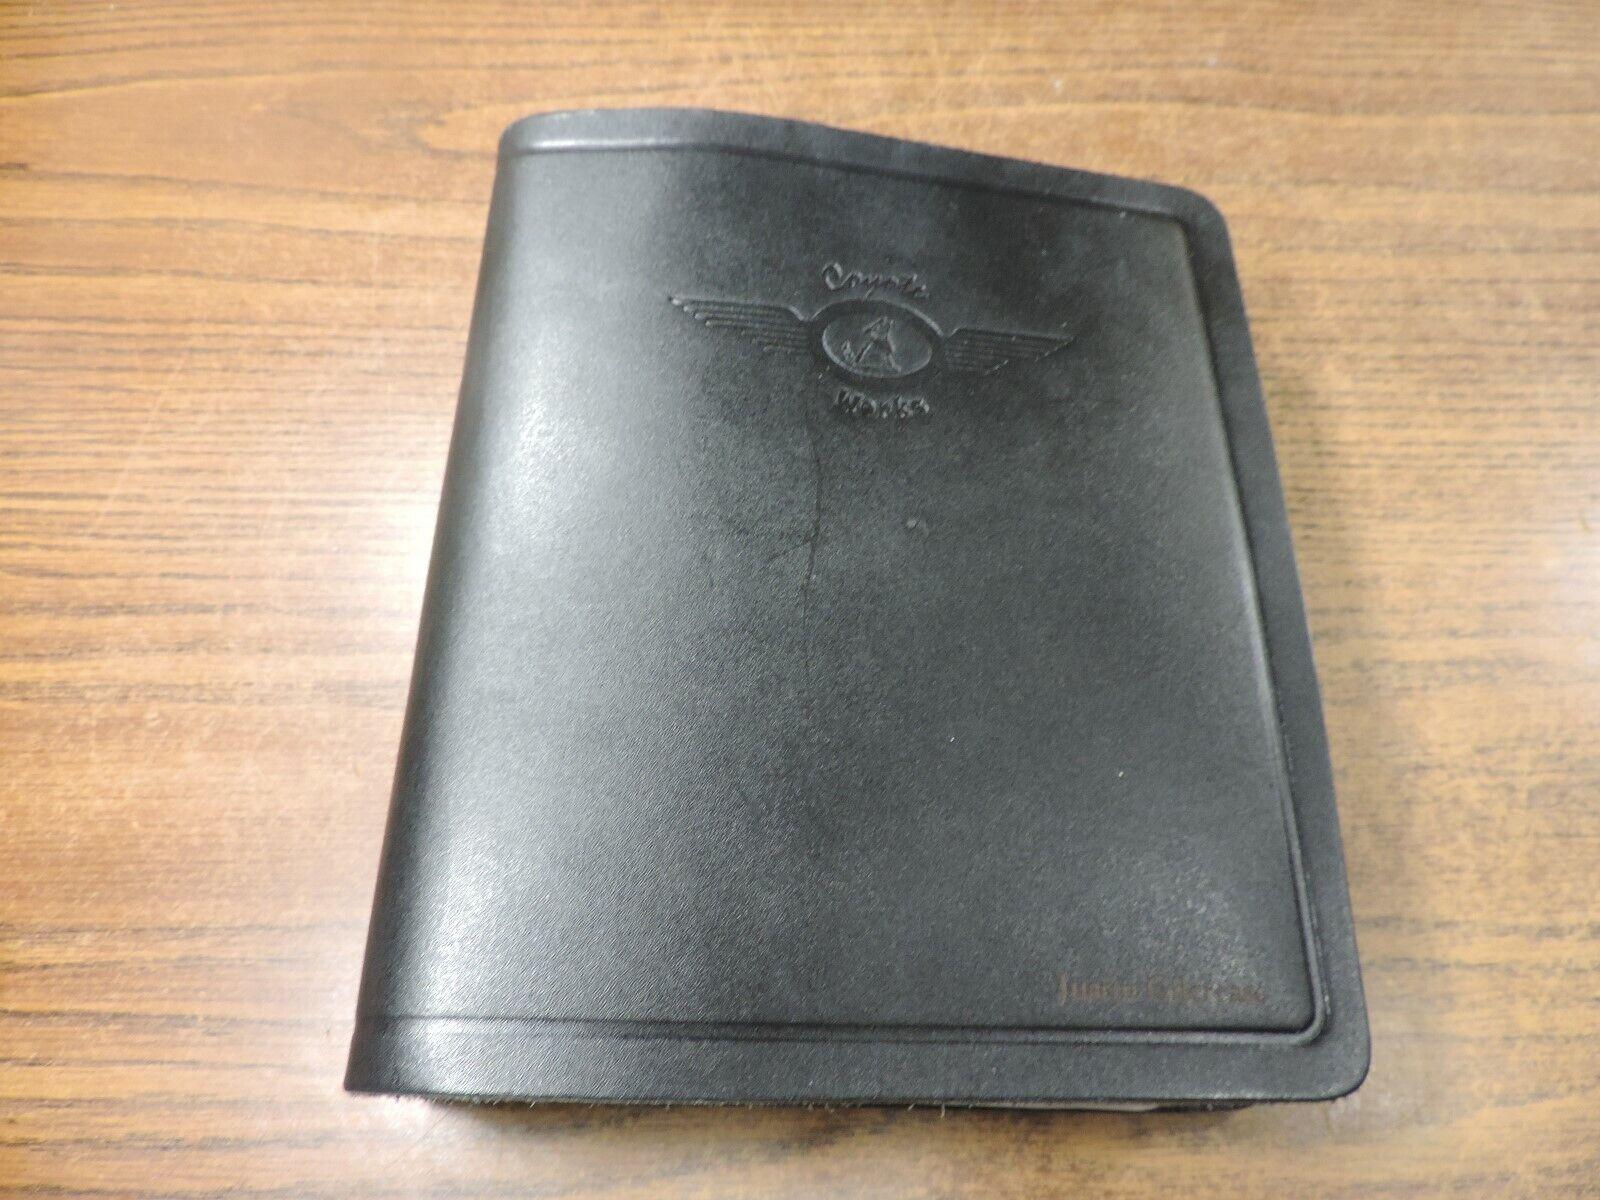 Coyote Works Binder W/ Jeppesen Airway Manual Charts & Procedures black